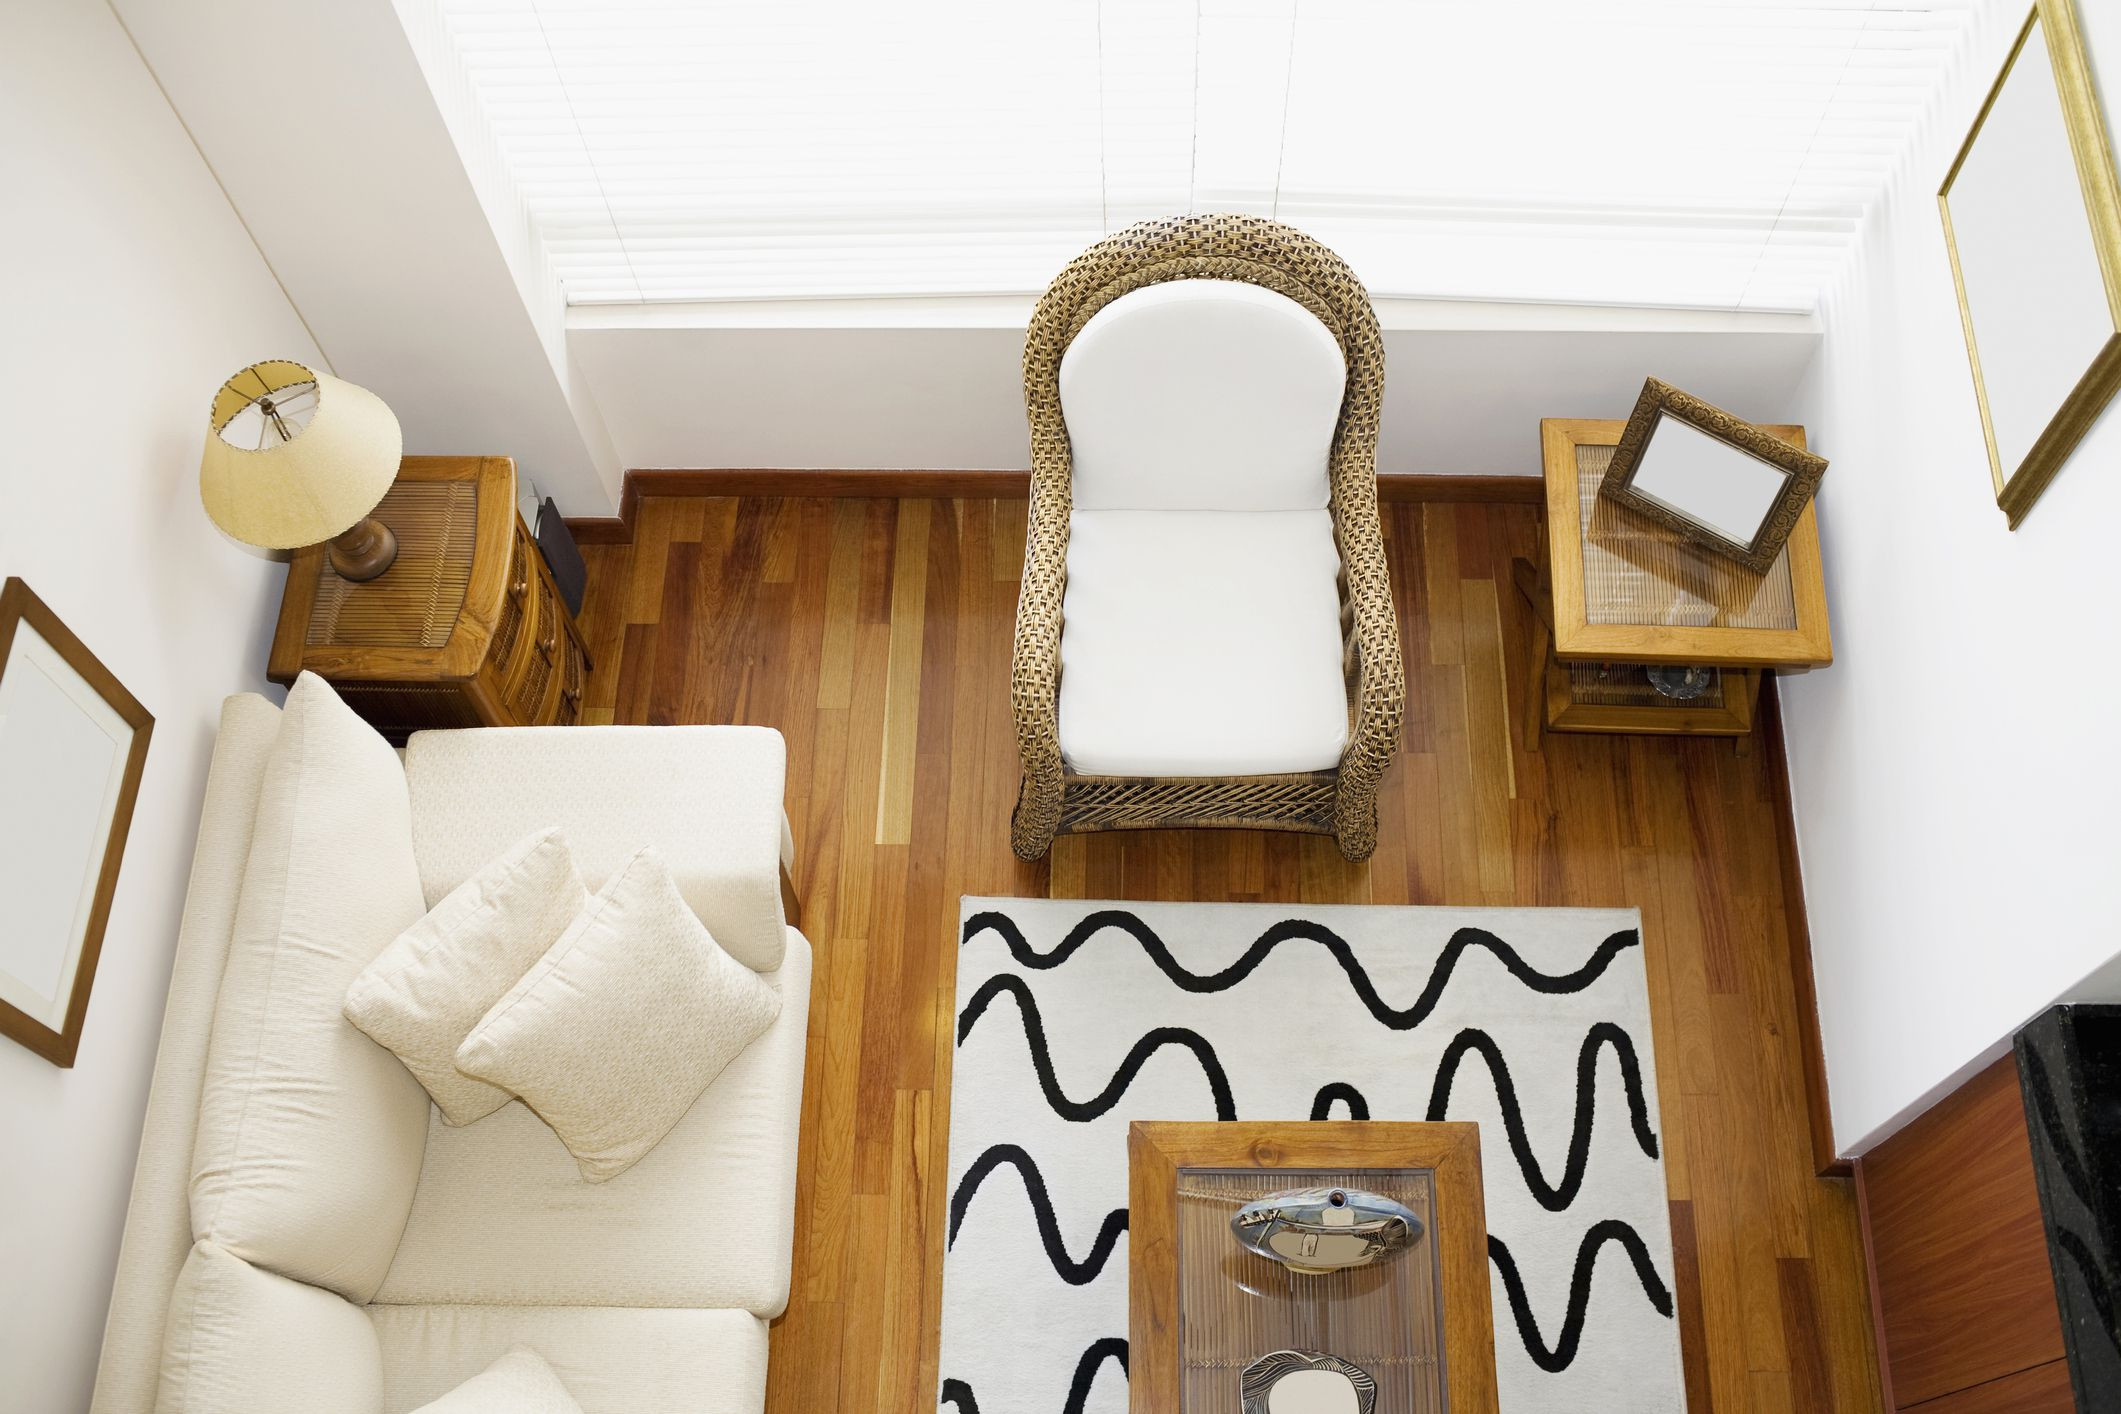 can you lay hardwood floors over tile of stop putting hardwood floors in every room regarding 1480712606 hardwood floor rug